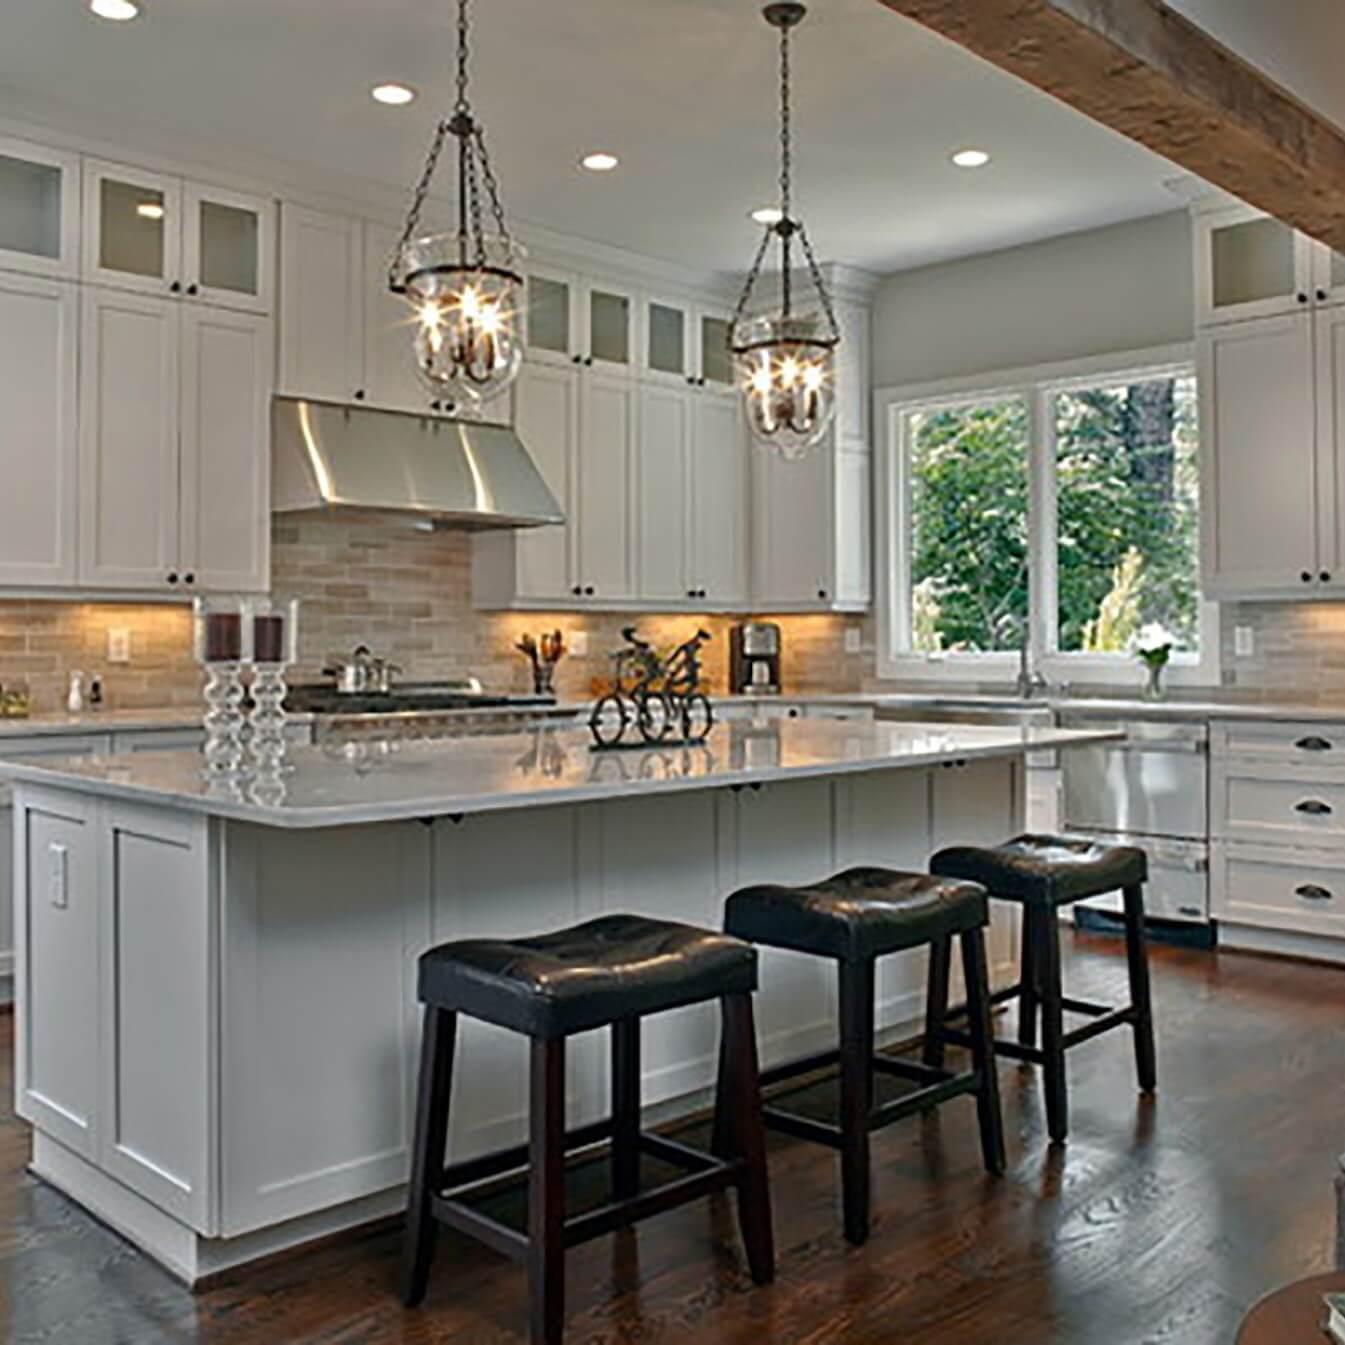 Mend A Bath Home Products, Bathroom Tiles, Resurfacing